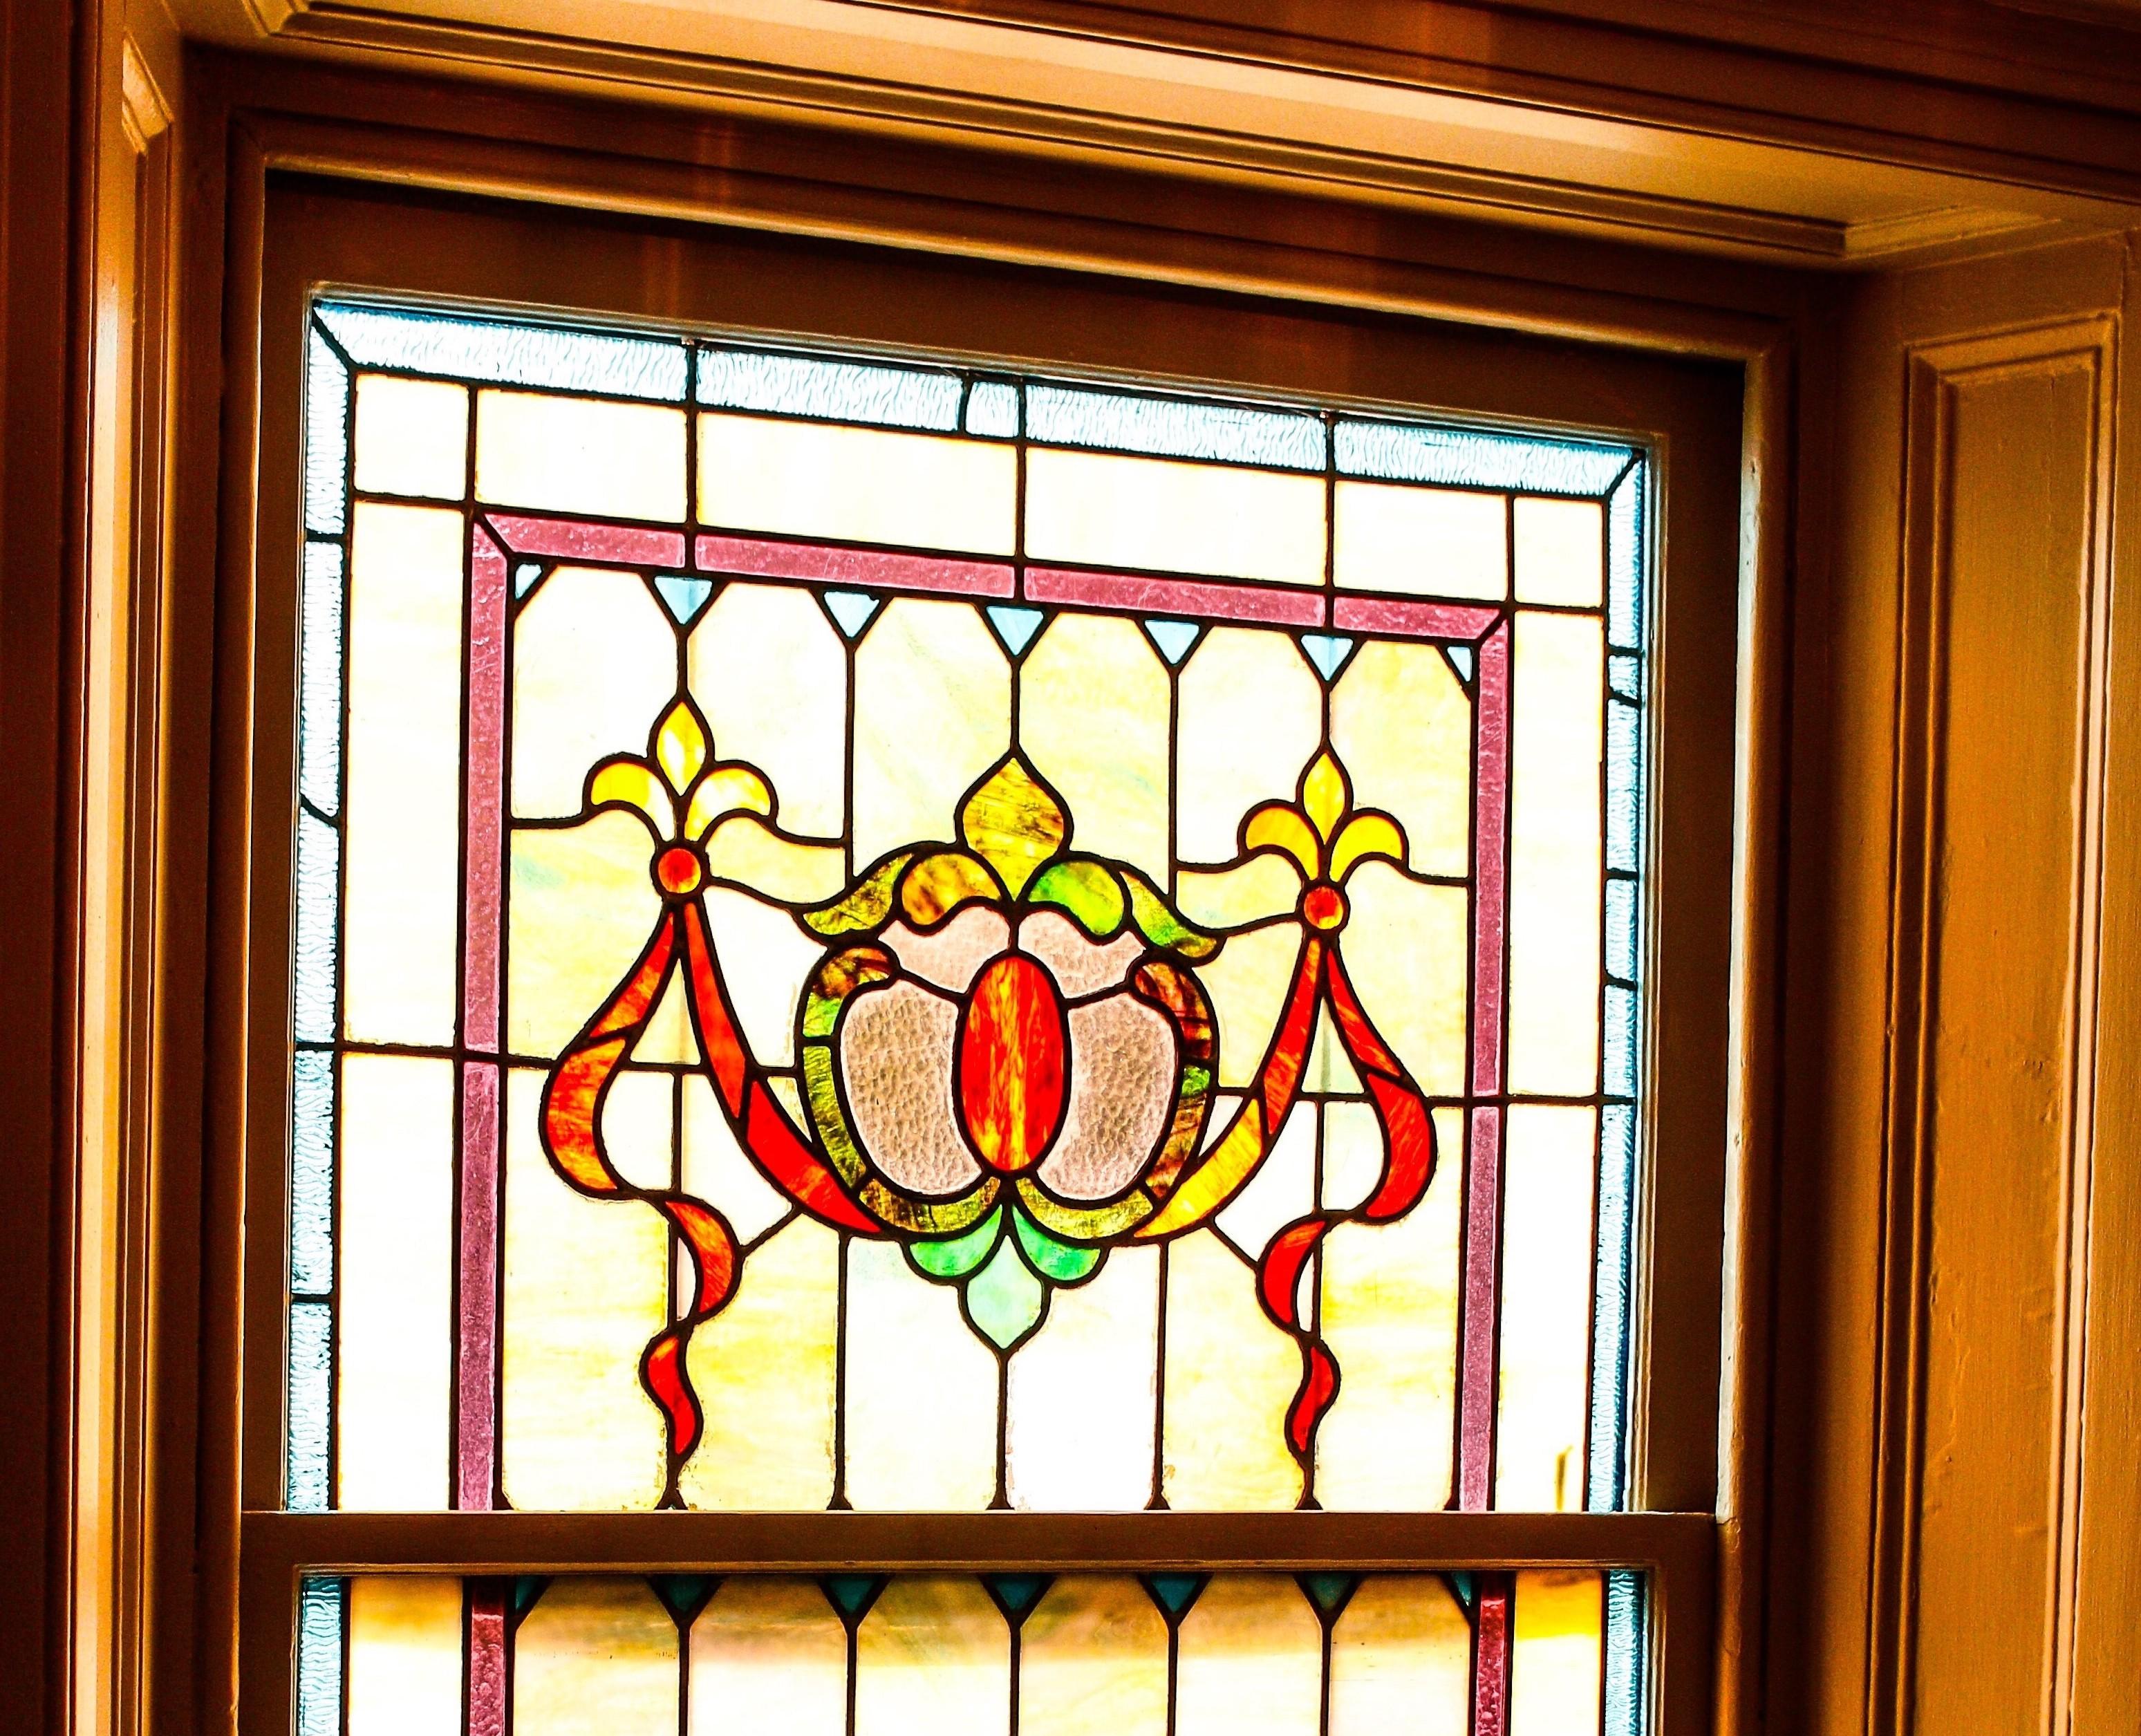 stained glass window photo Upper Gwynedd, PA MRK Wealth Advisors